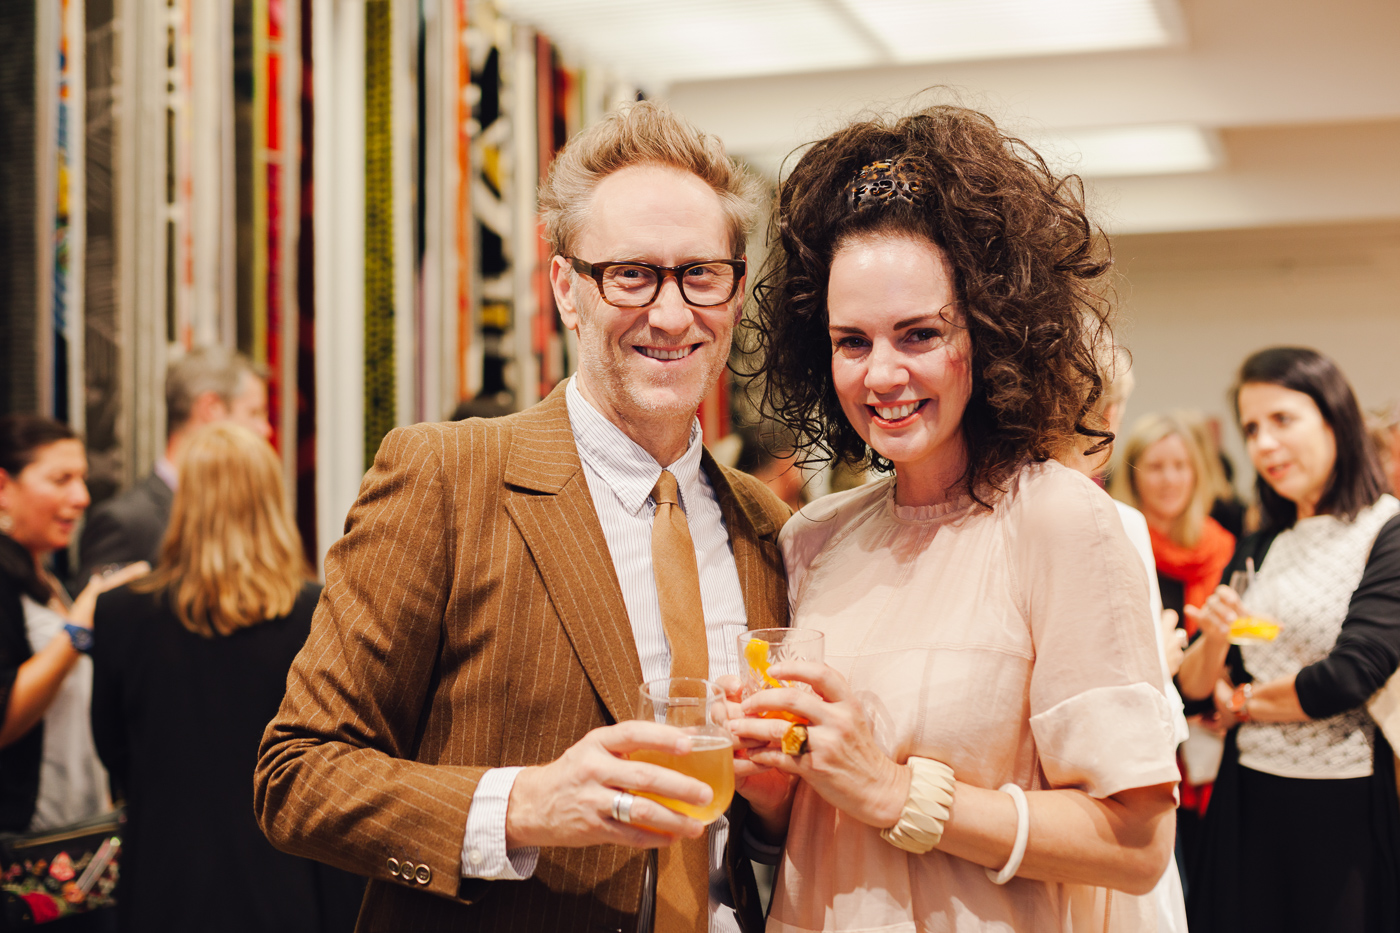 Mark Smith & Lynda Gardener | NEW AGAIN by Petrina Turner Design for Designer Rugs | The launch event